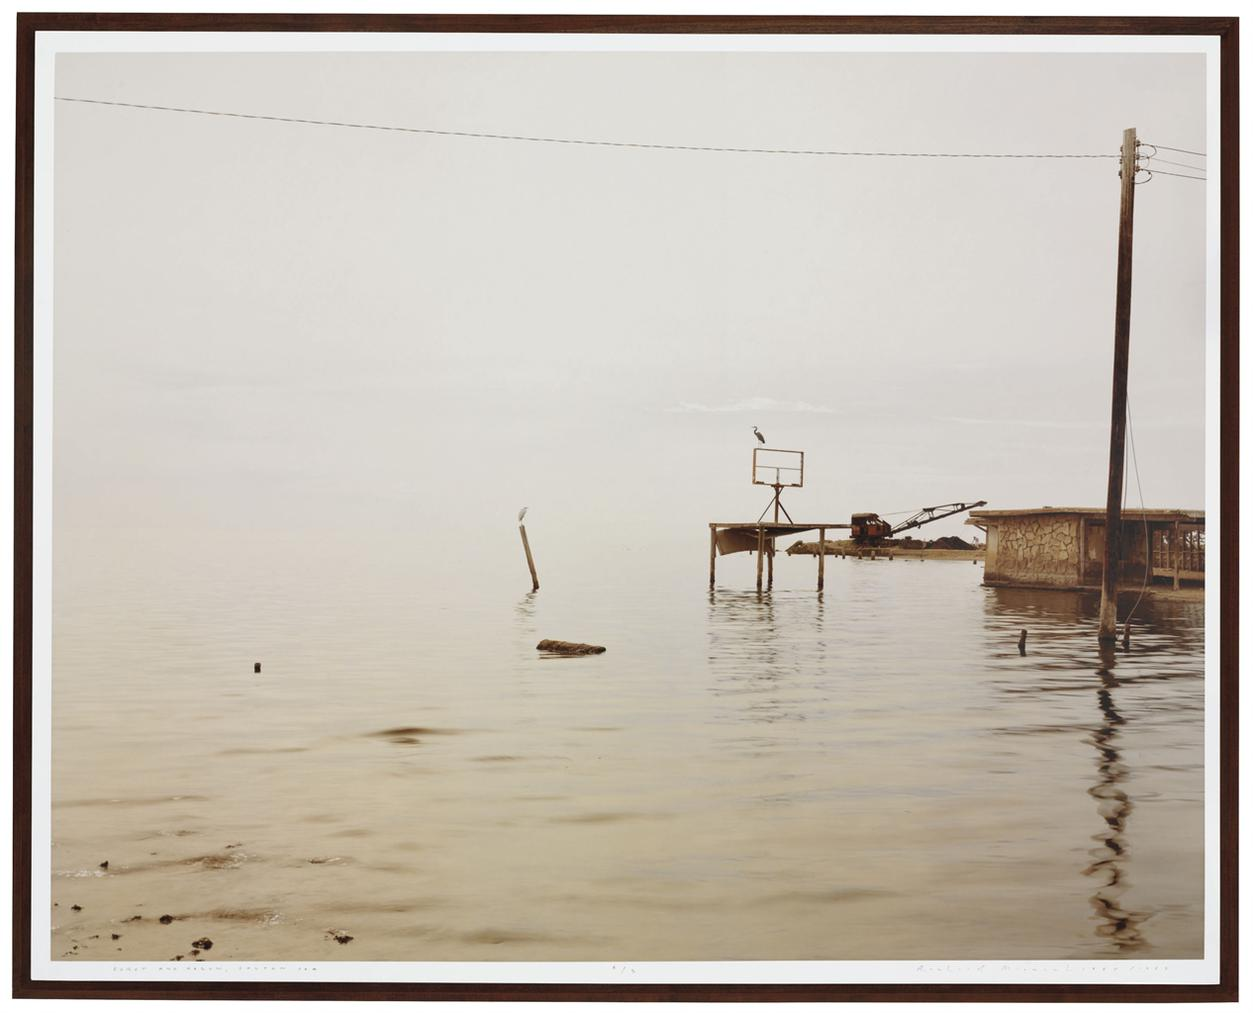 Richard Misrach-Egret And Heron, Salton Sea-1985